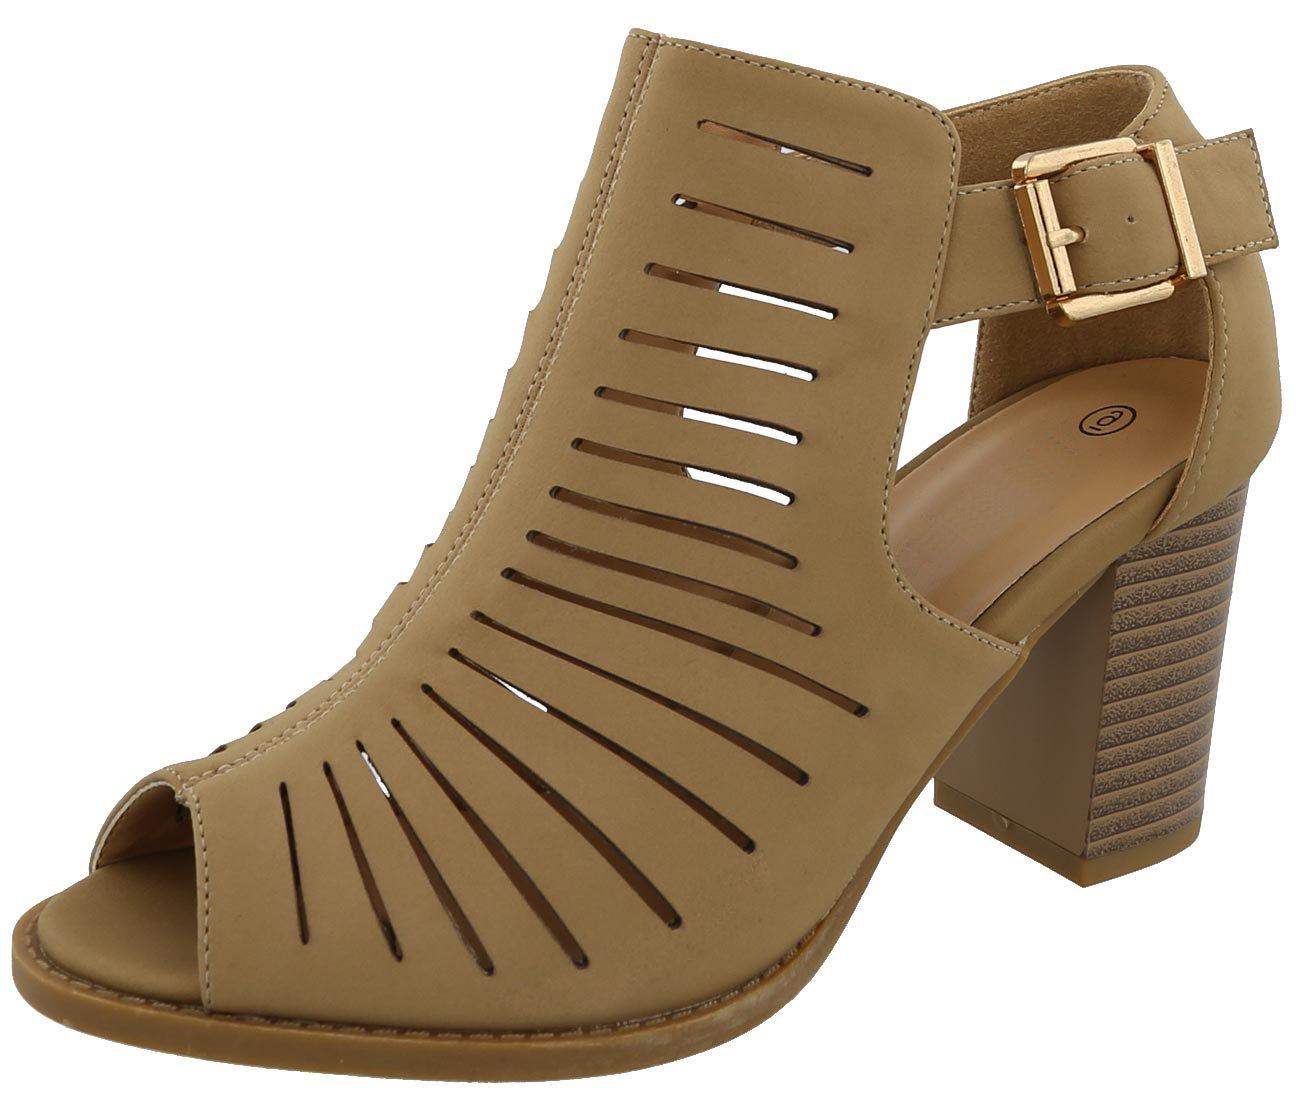 Cambridge Select Women's Peep Toe Caged Laser Cutout Chunky Stacked Block Heel Ankle Bootie,8.5 B(M) US,Tan NBPU